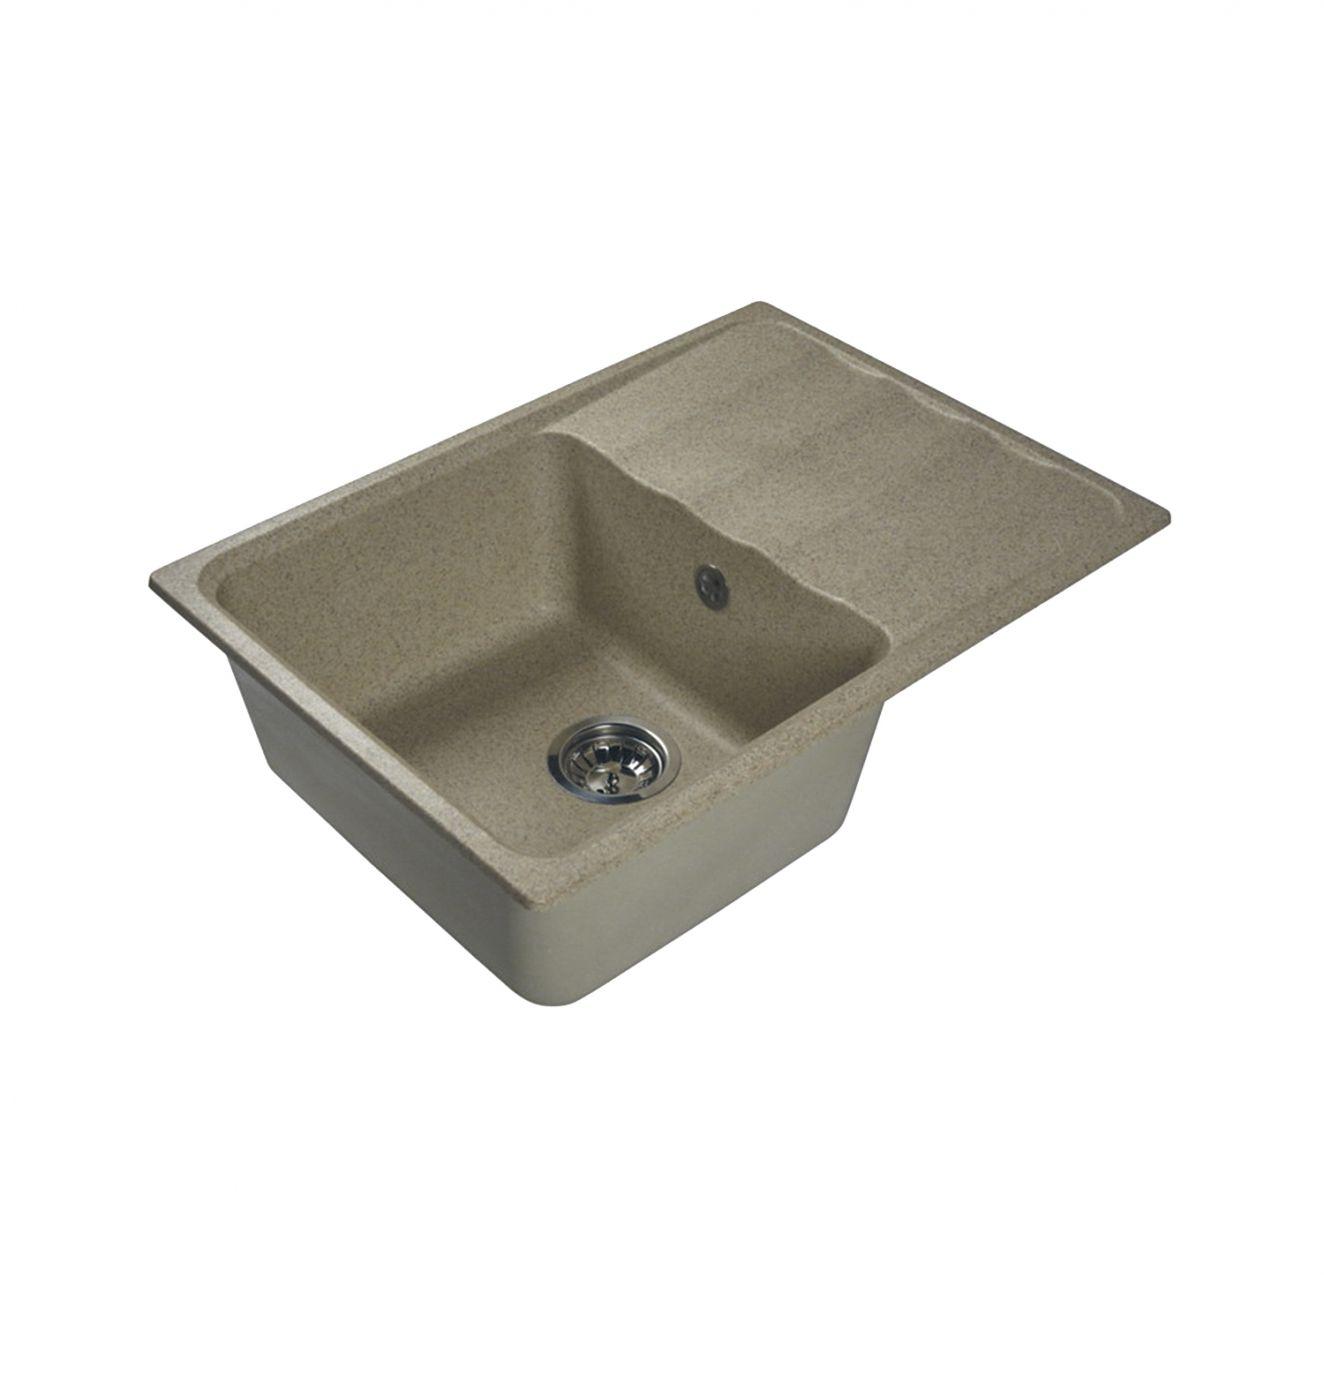 Врезная кухонная мойка LEX Sirino 680 Sand  68х49см искусственный мрамор RULE000107